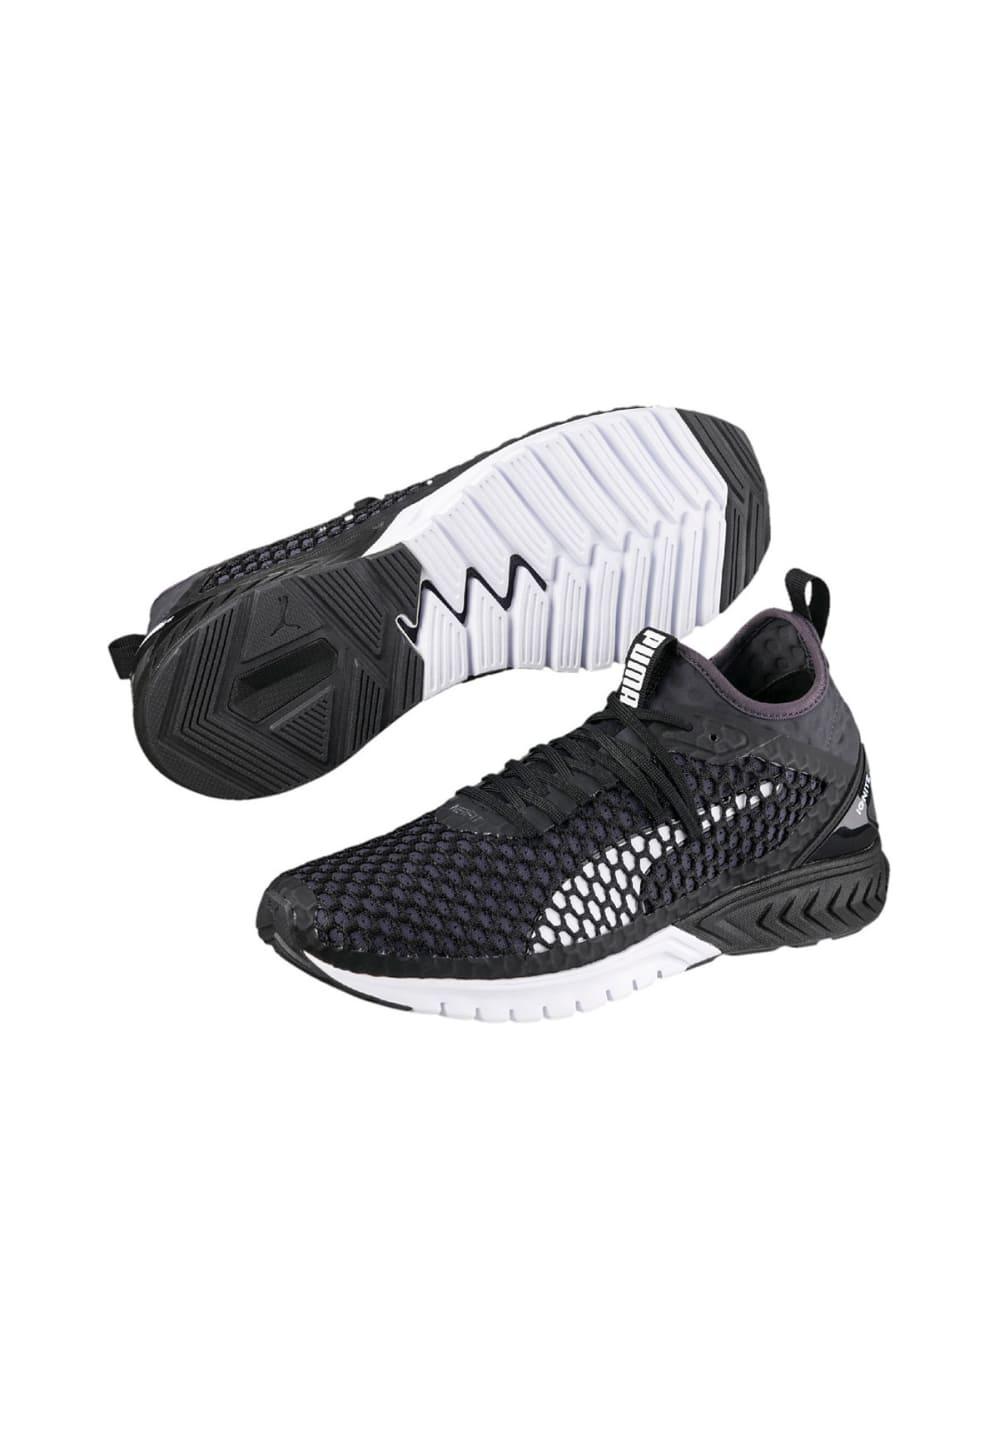 Chaussures de running | Puma | Ignite Dual Netfit Shoes